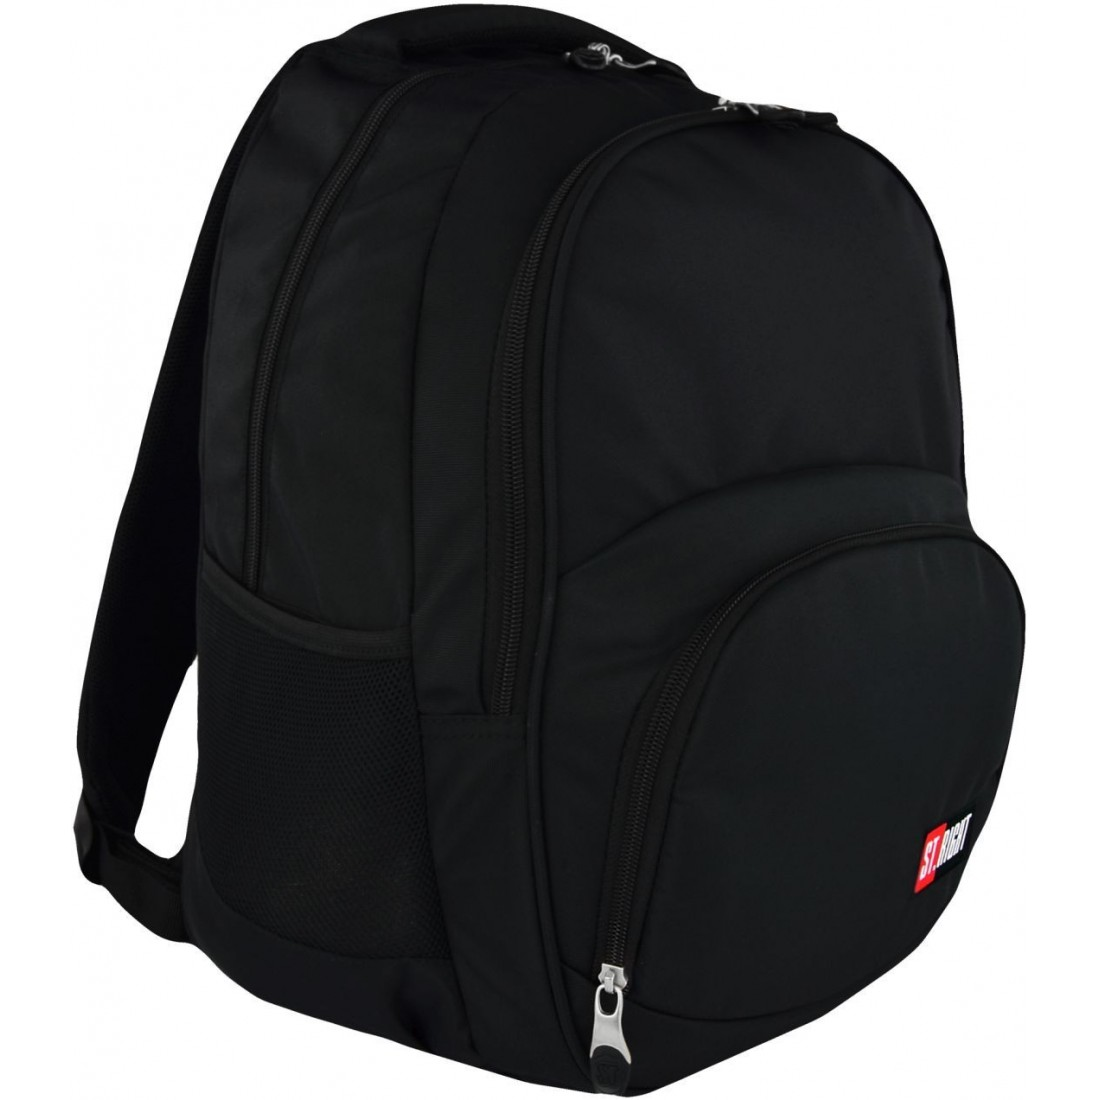 Plecak szkolny ST.RIGHT ST.BLACK 2 komory czarny BP23